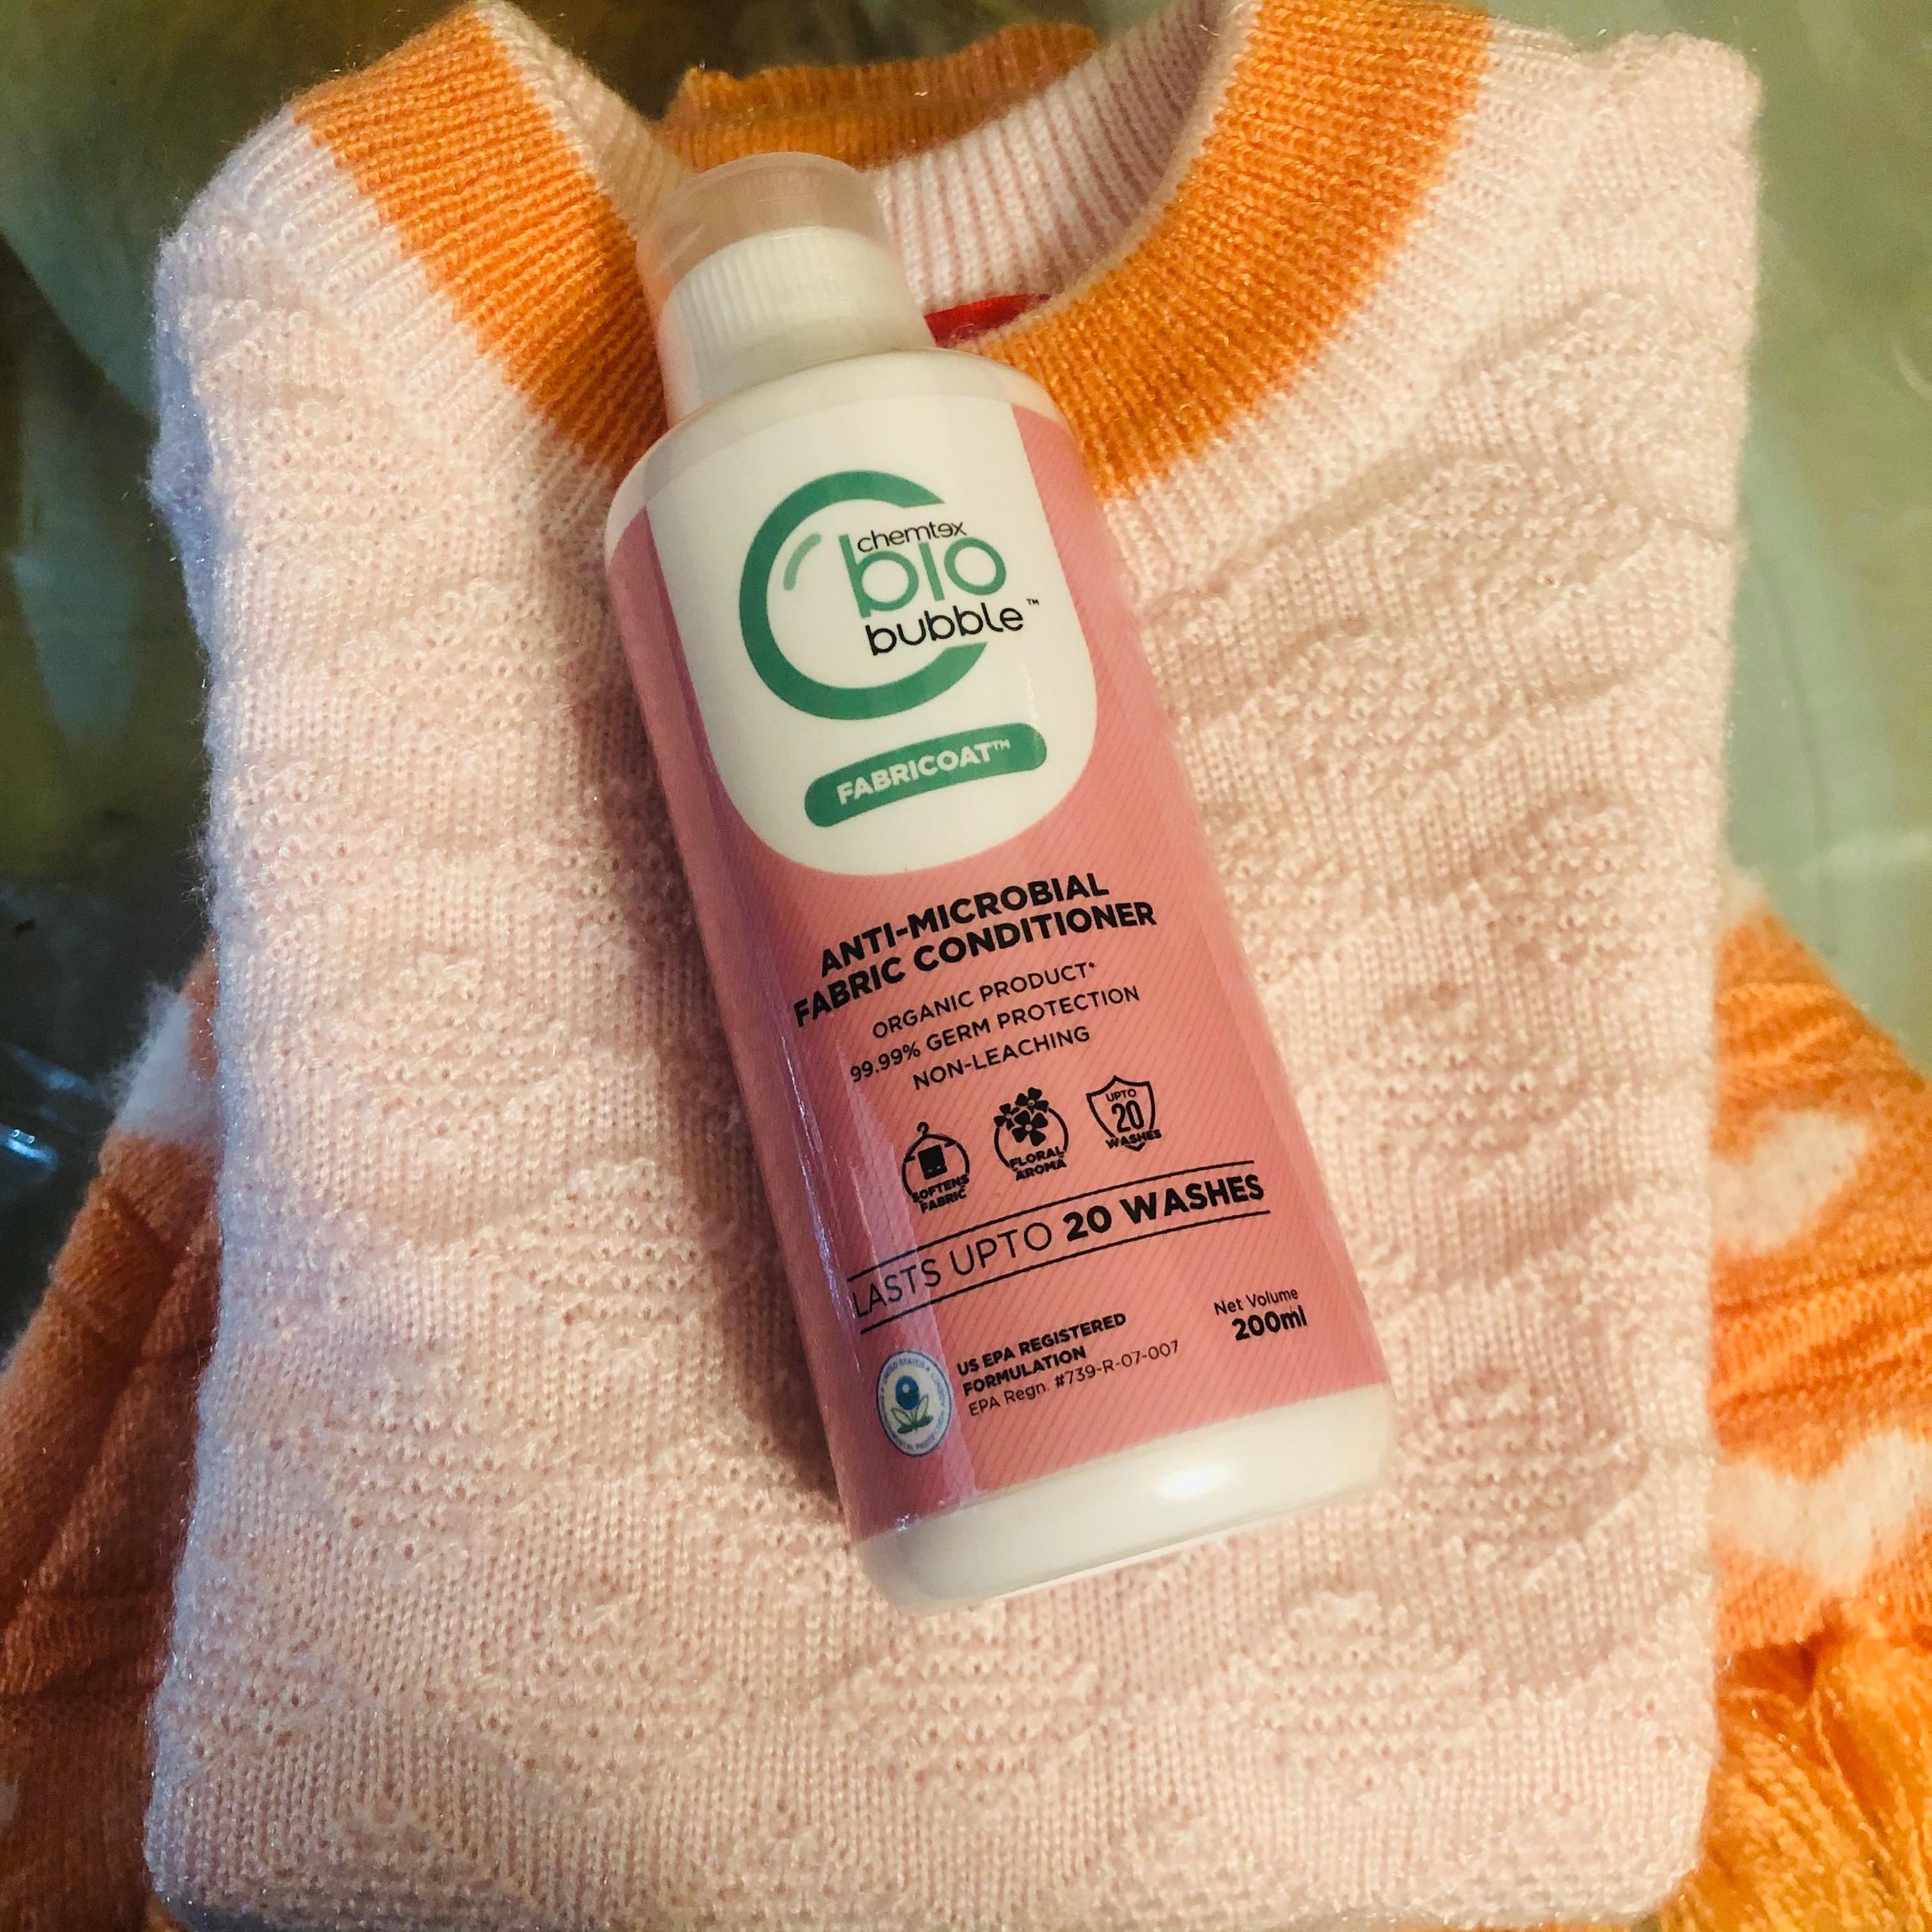 Chemtext Biobubble Fabricoat-Organic Fabric Conditioner keeps germs away-By priyanshi_saini